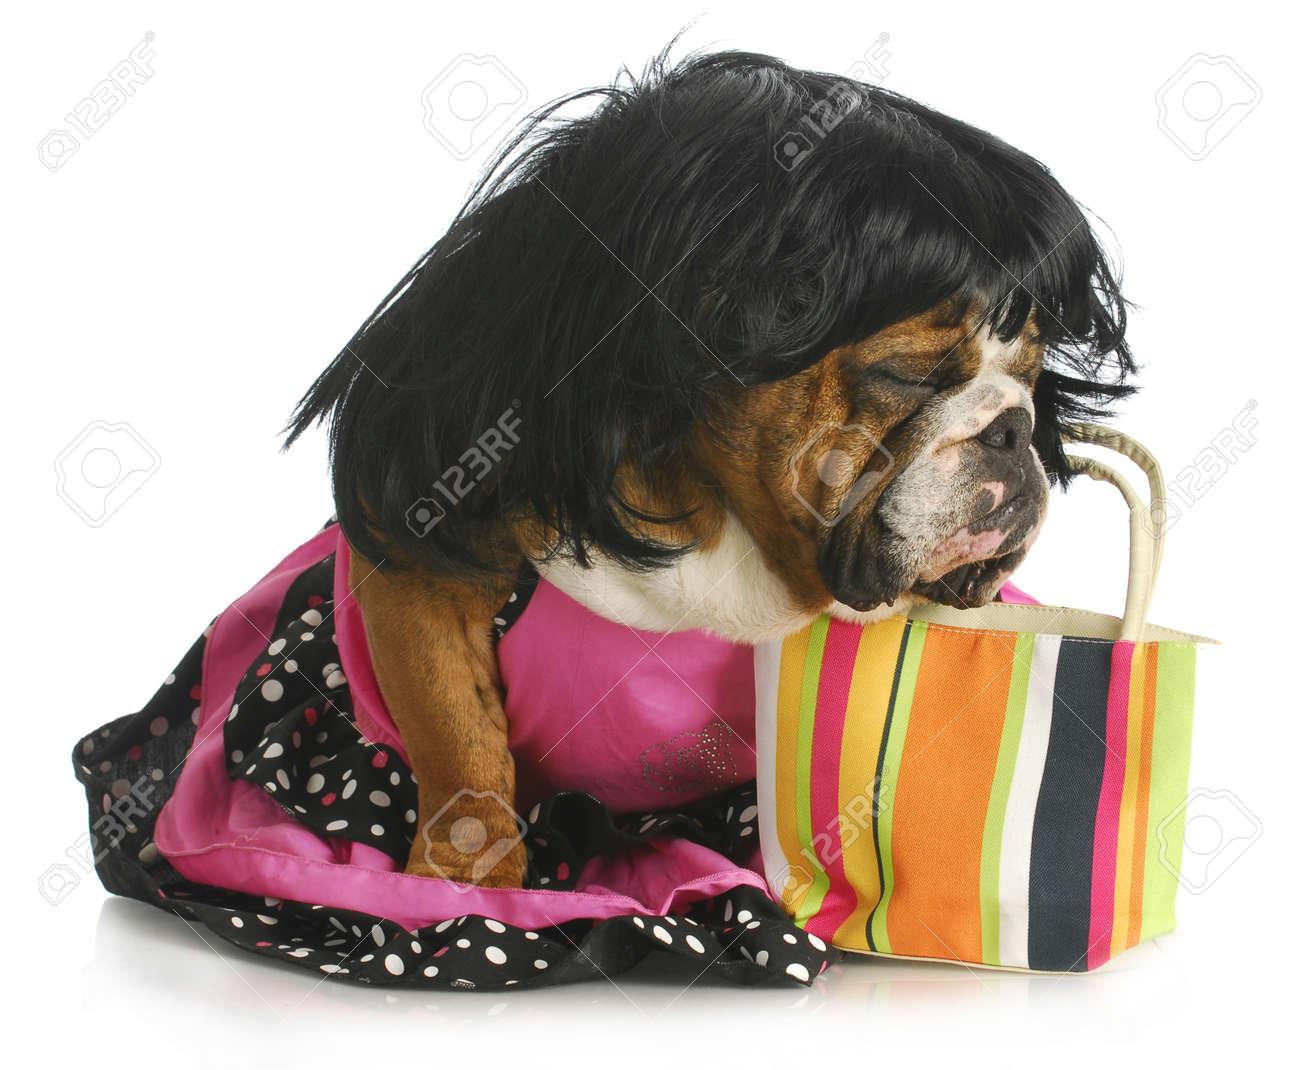 female dog - english bulldog wearing wig and dress sitting beside purse Stock Photo - 13291094